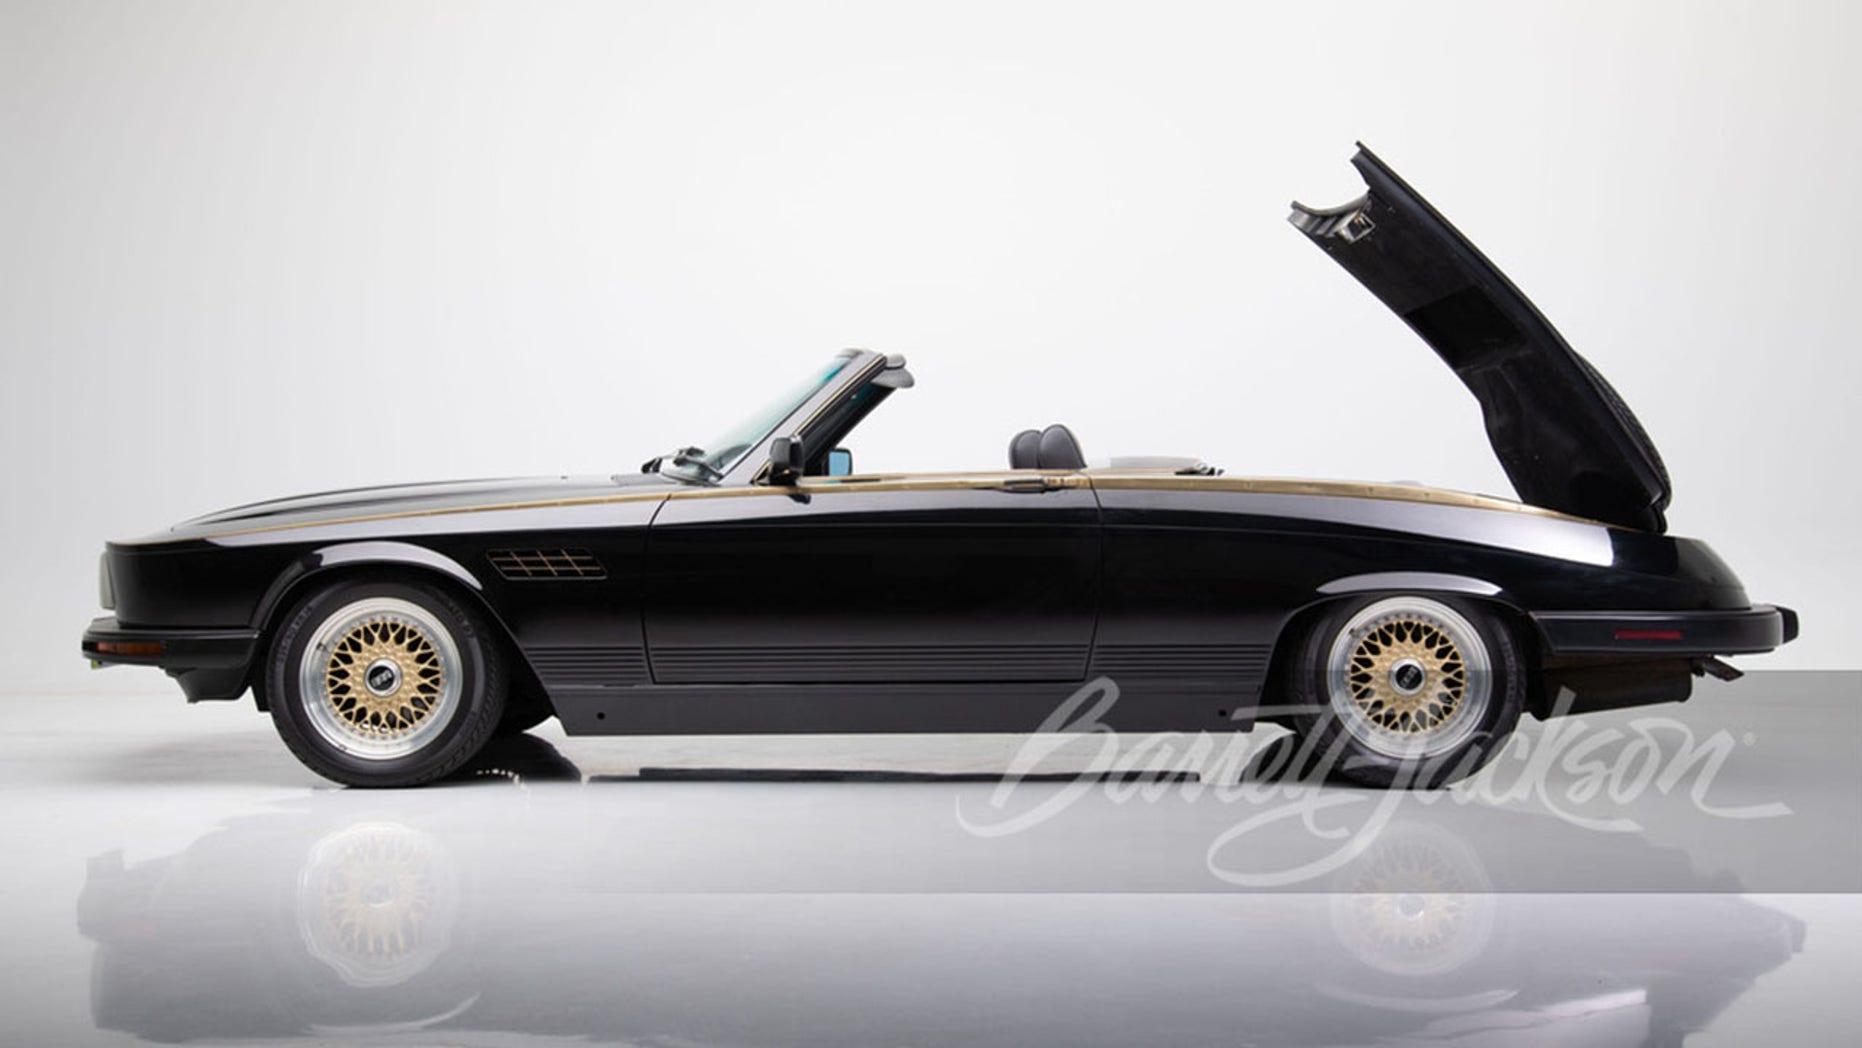 Wayne Newton's wild custom Mercedes-Benz